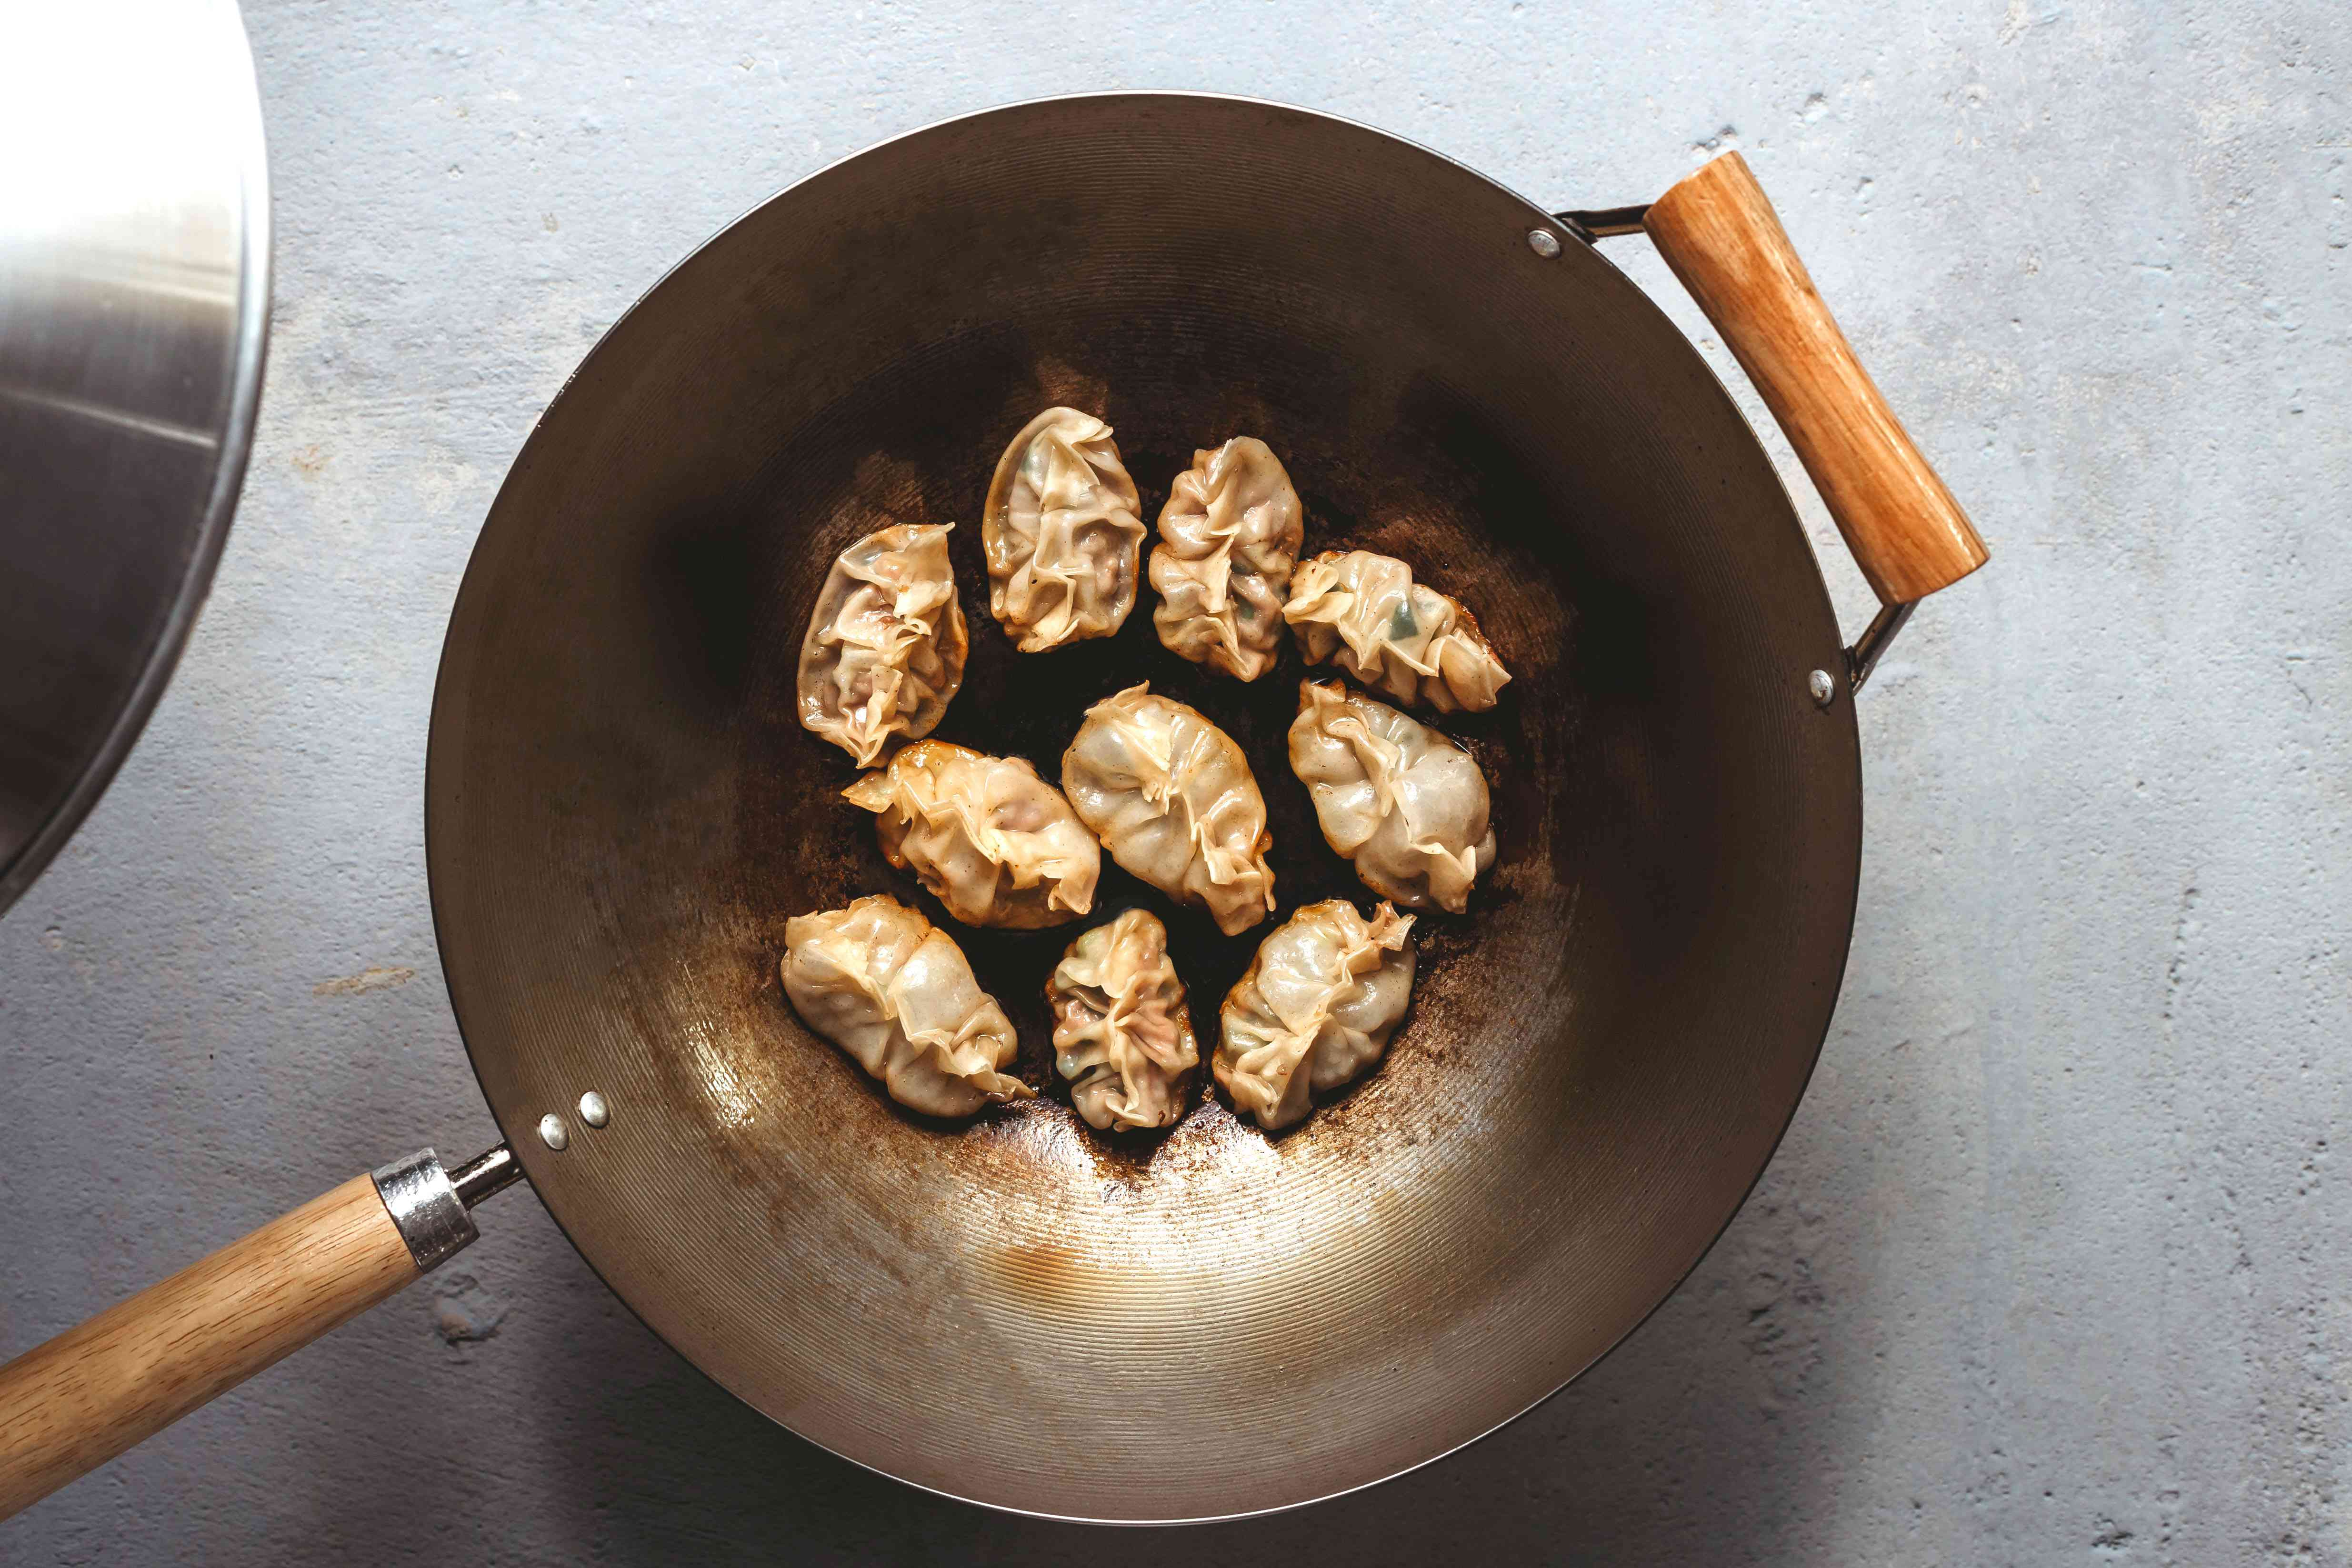 Steaming the dumplings in a wok